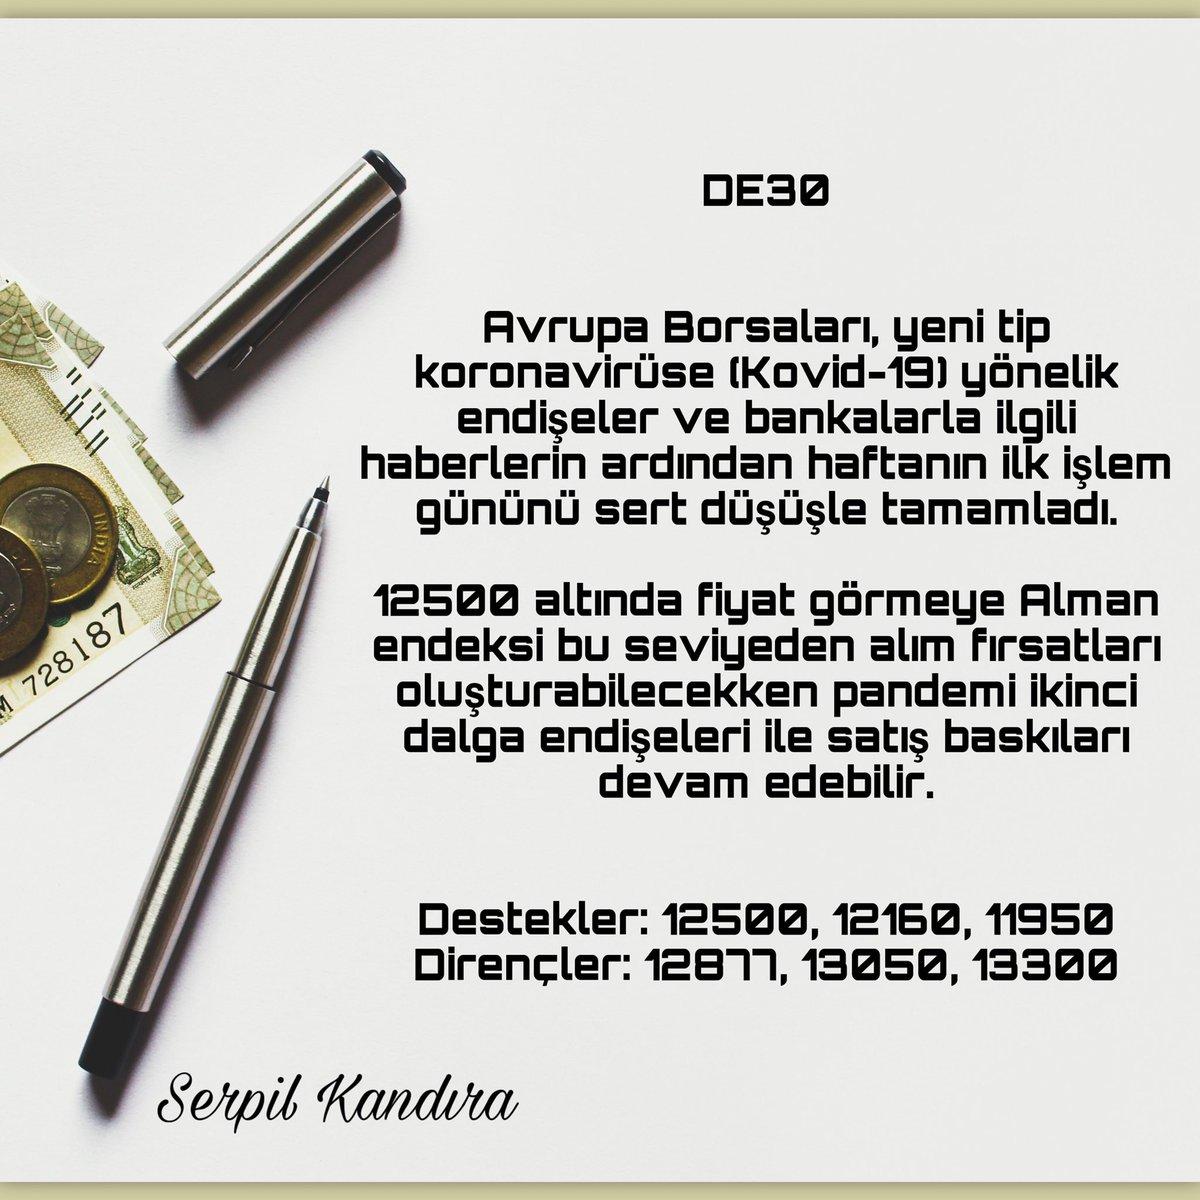 DE 30   #forex #fx #forextrader #yatırım #borsa #brent #DAX30 #para #bist #altın #gbpusd #parite #rt #fav https://t.co/1Mp0pHGclA